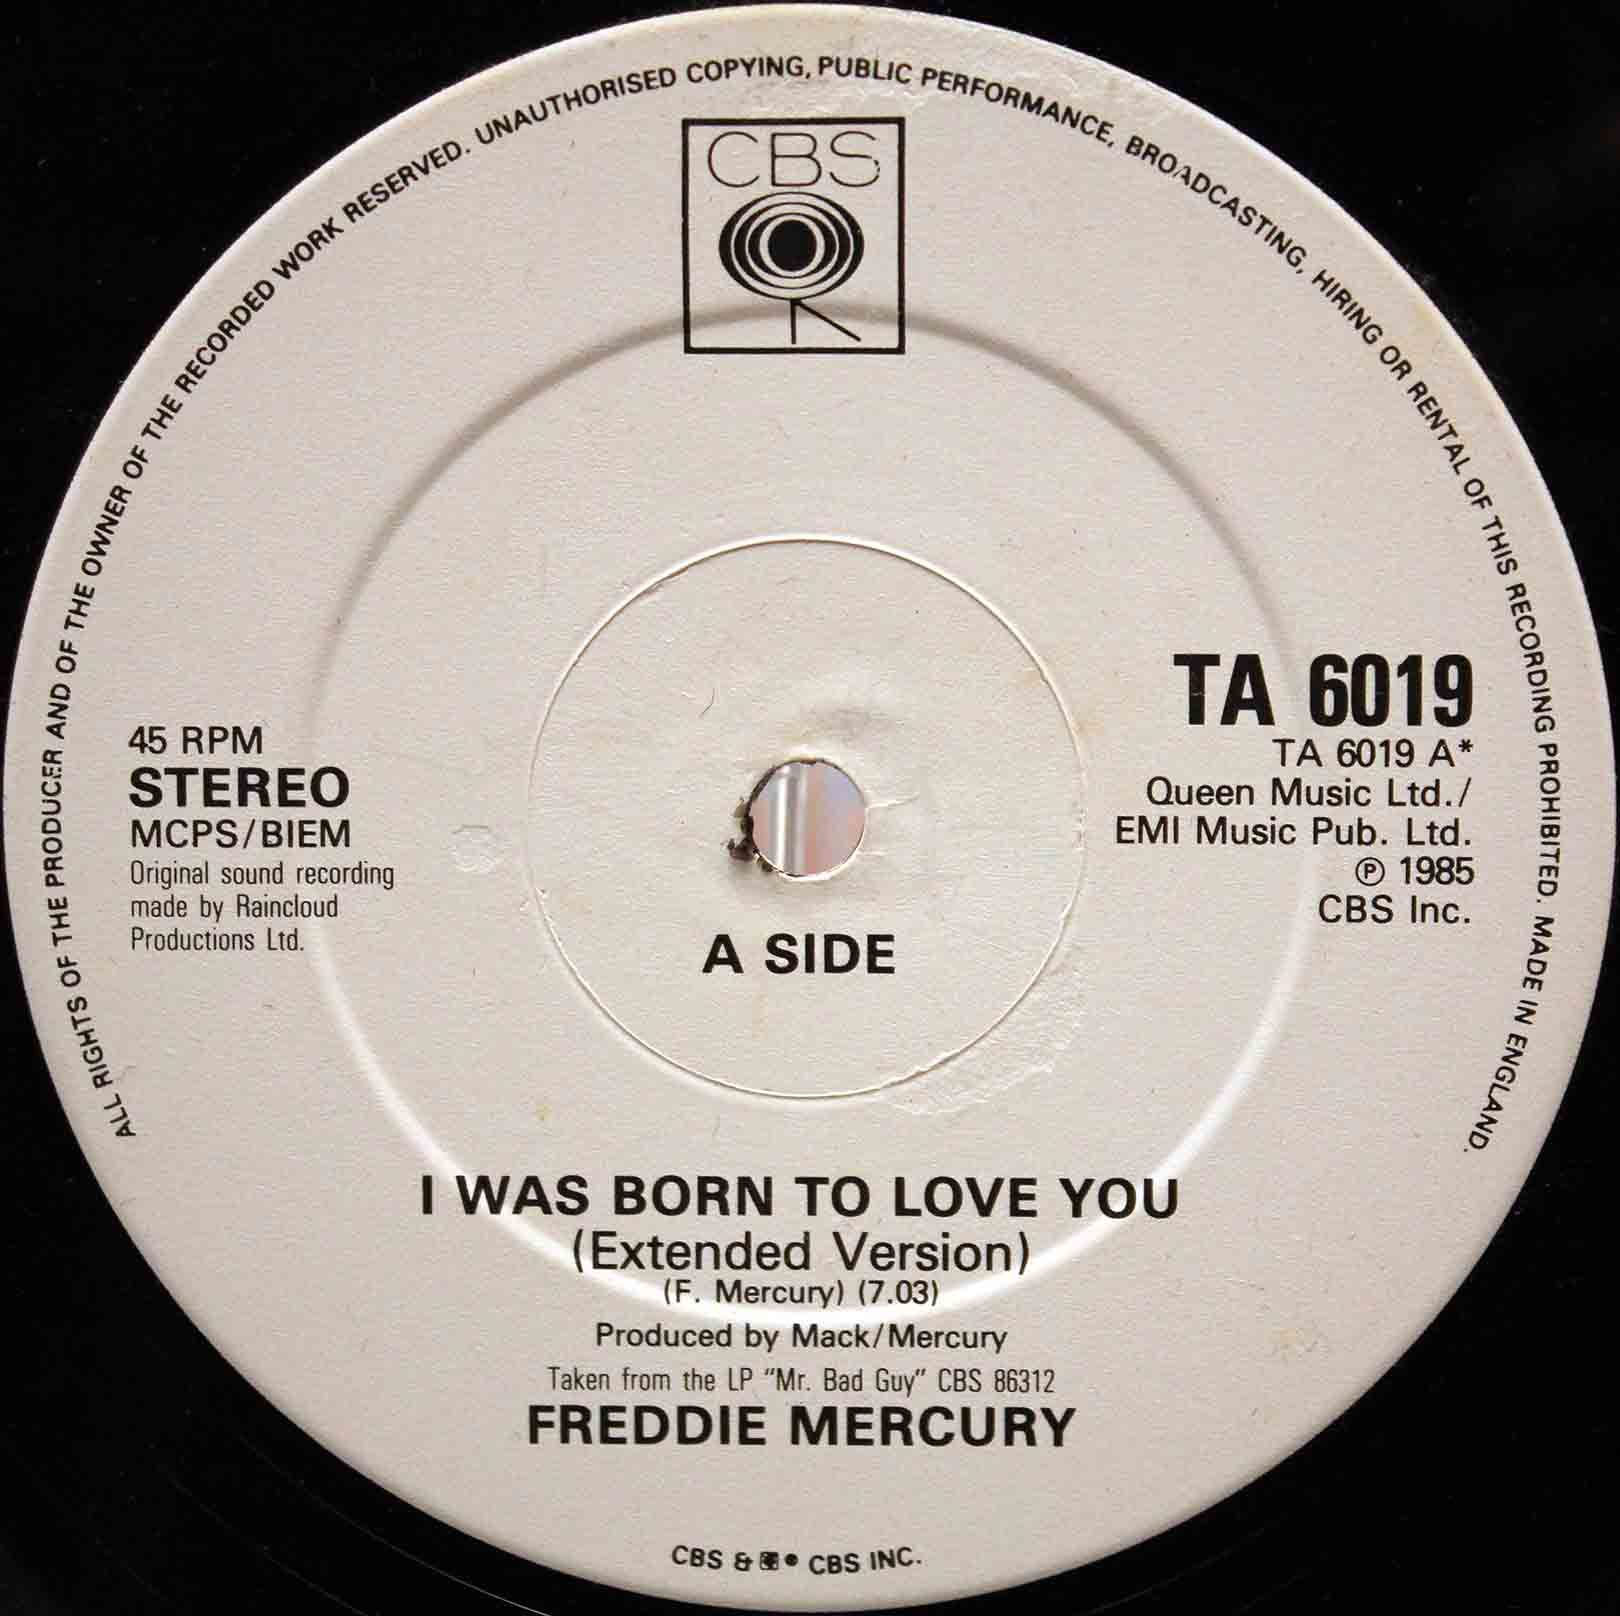 Freddie Mercury – I Was Born To Love You 03